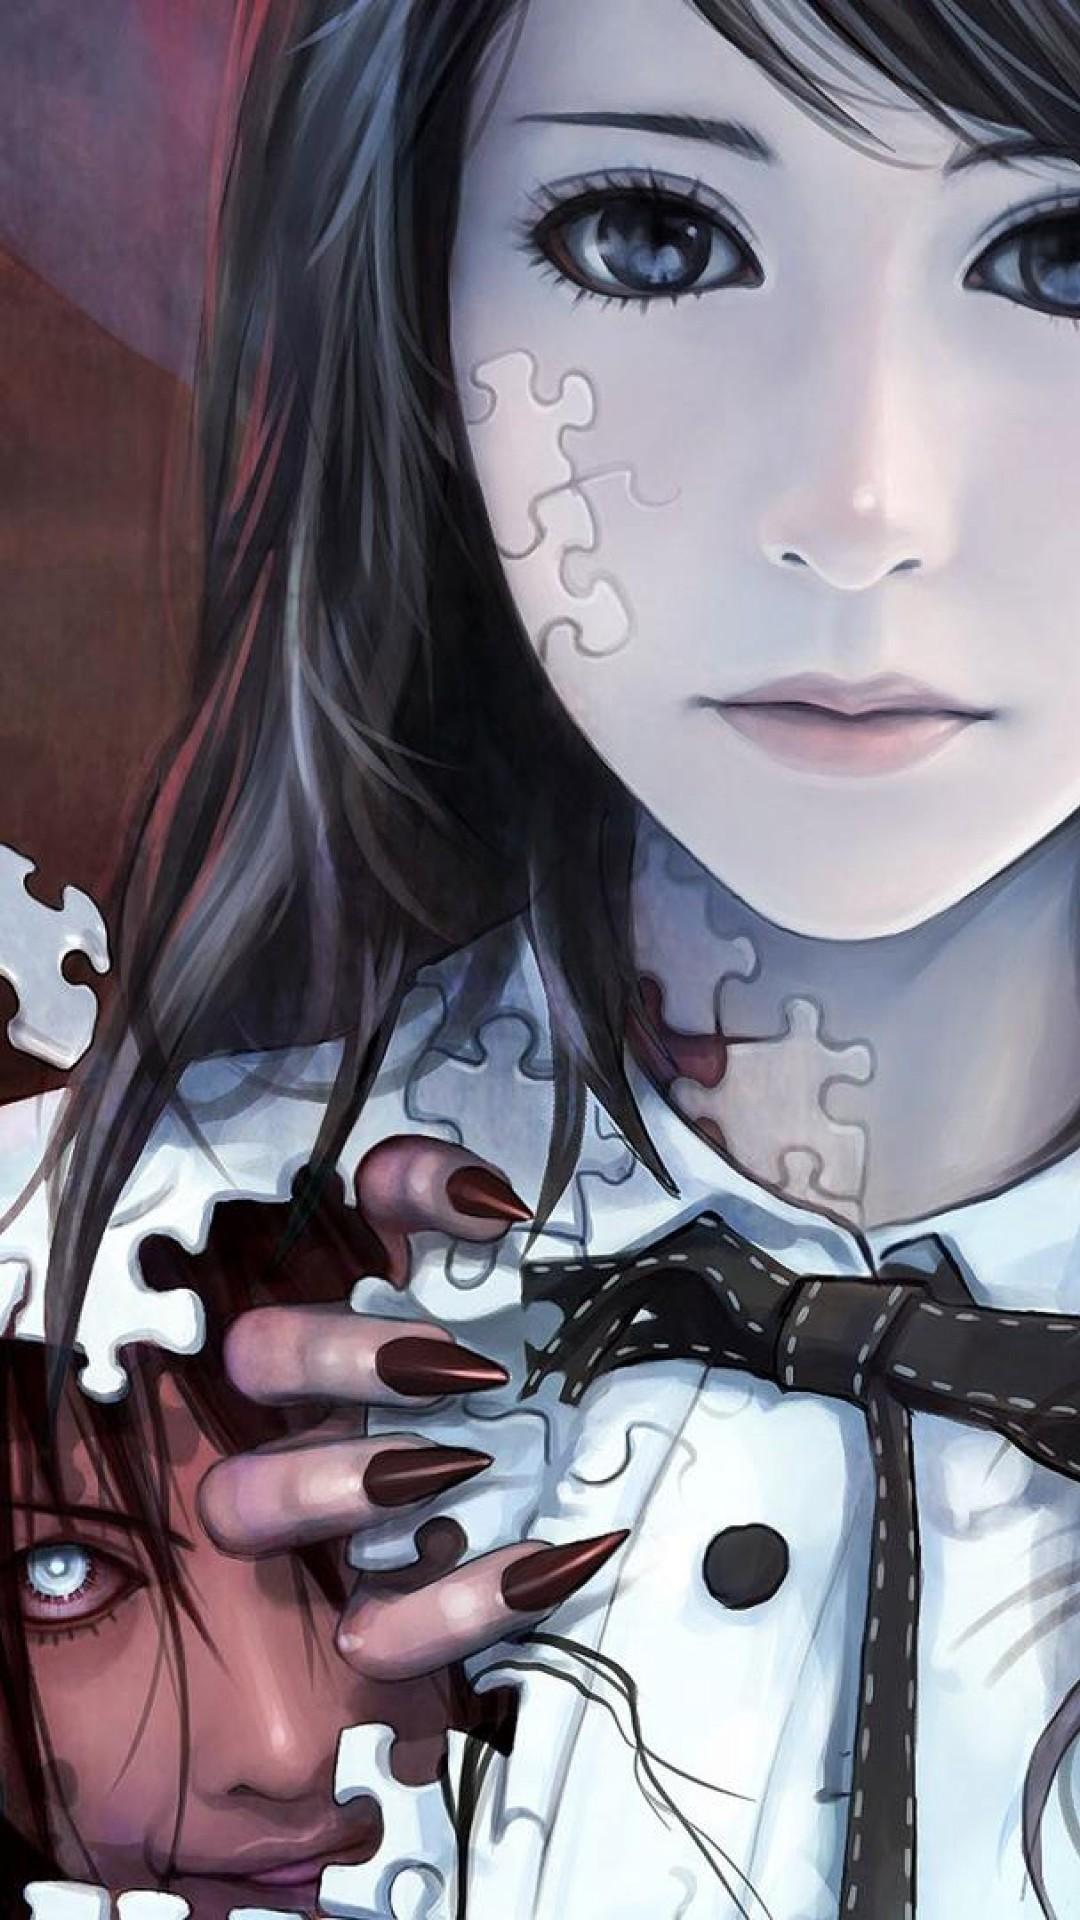 Cute Small Girl Full Hd Wallpaper Anime Iphone Backgrounds Pixelstalk Net